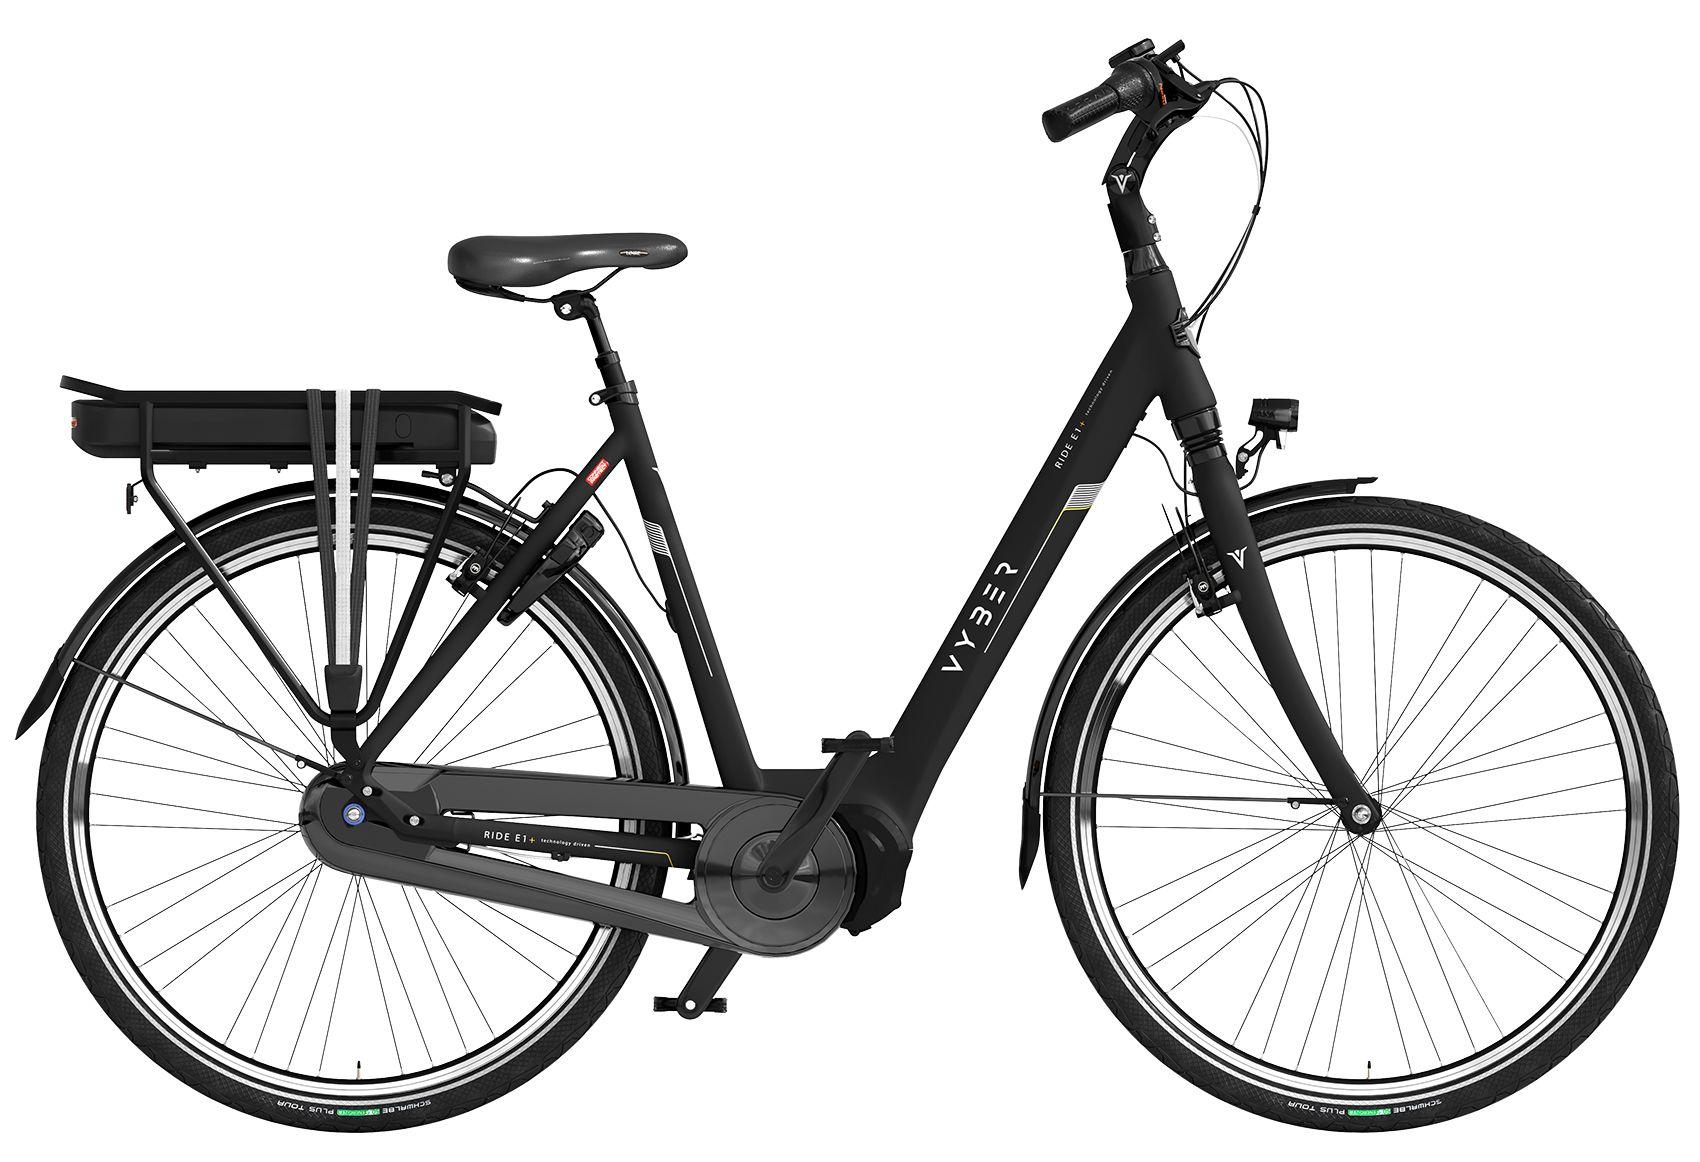 Vyber Ride E1+ M7 2021 Dames elektrische fiets